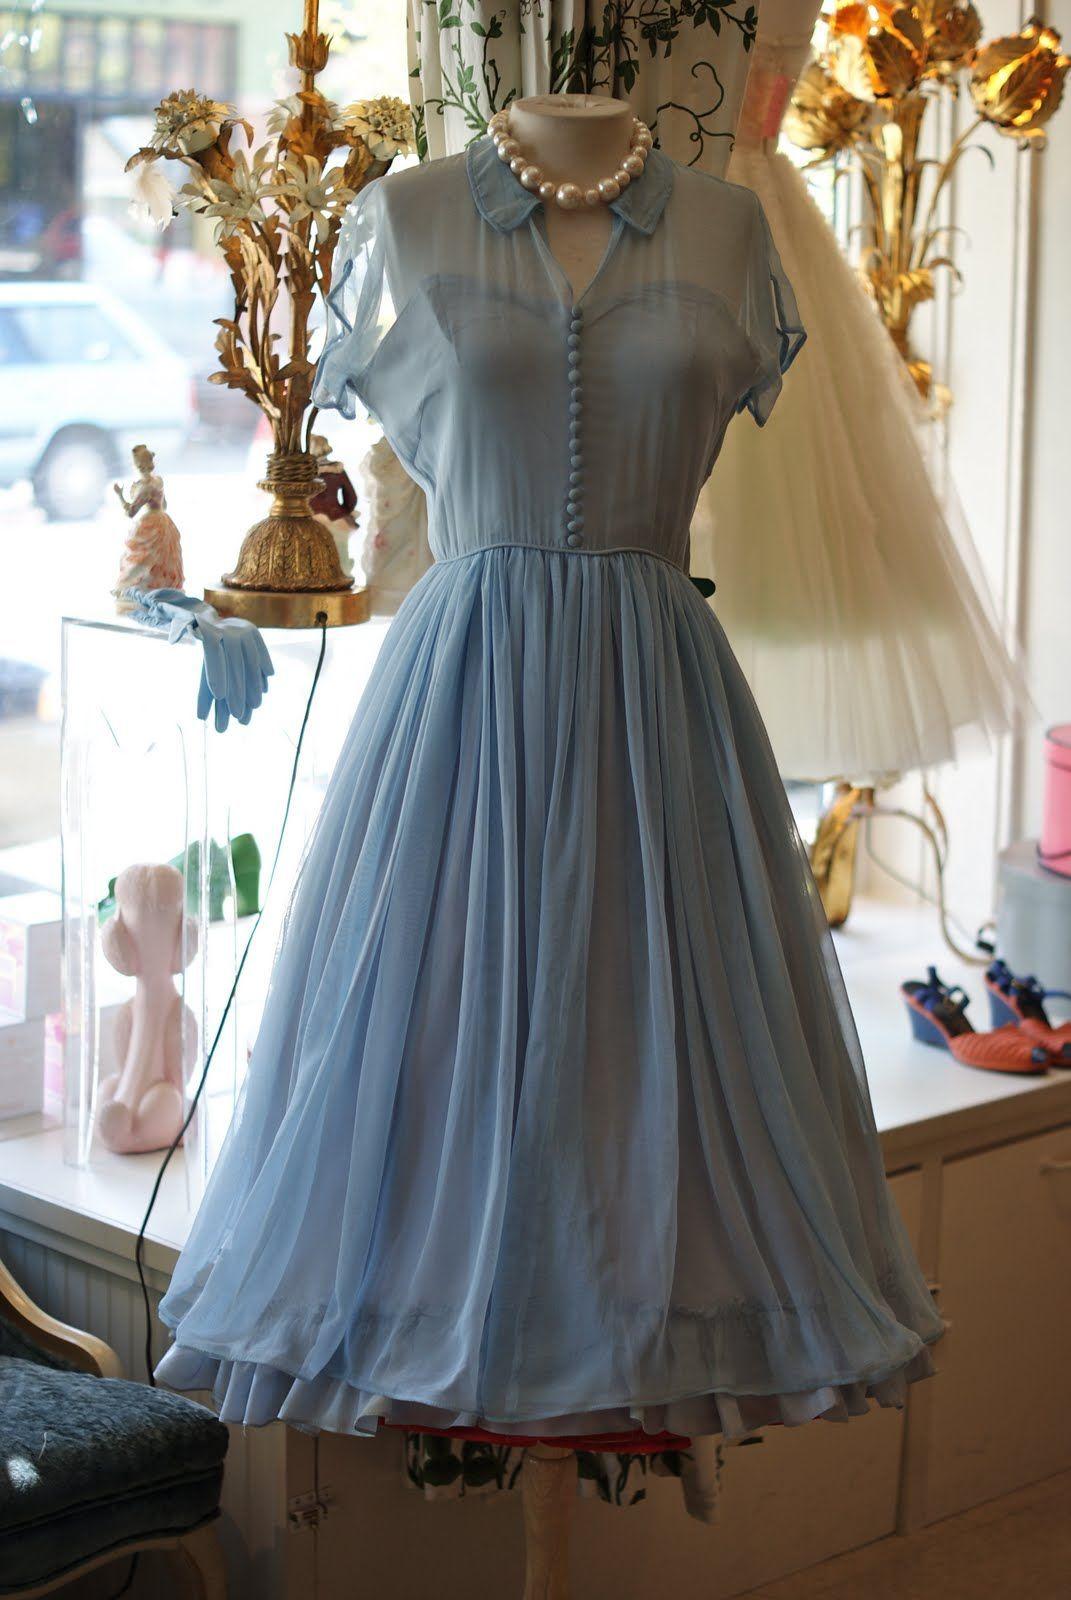 Us emma domb powder blue prom dress vintageclothing grunge